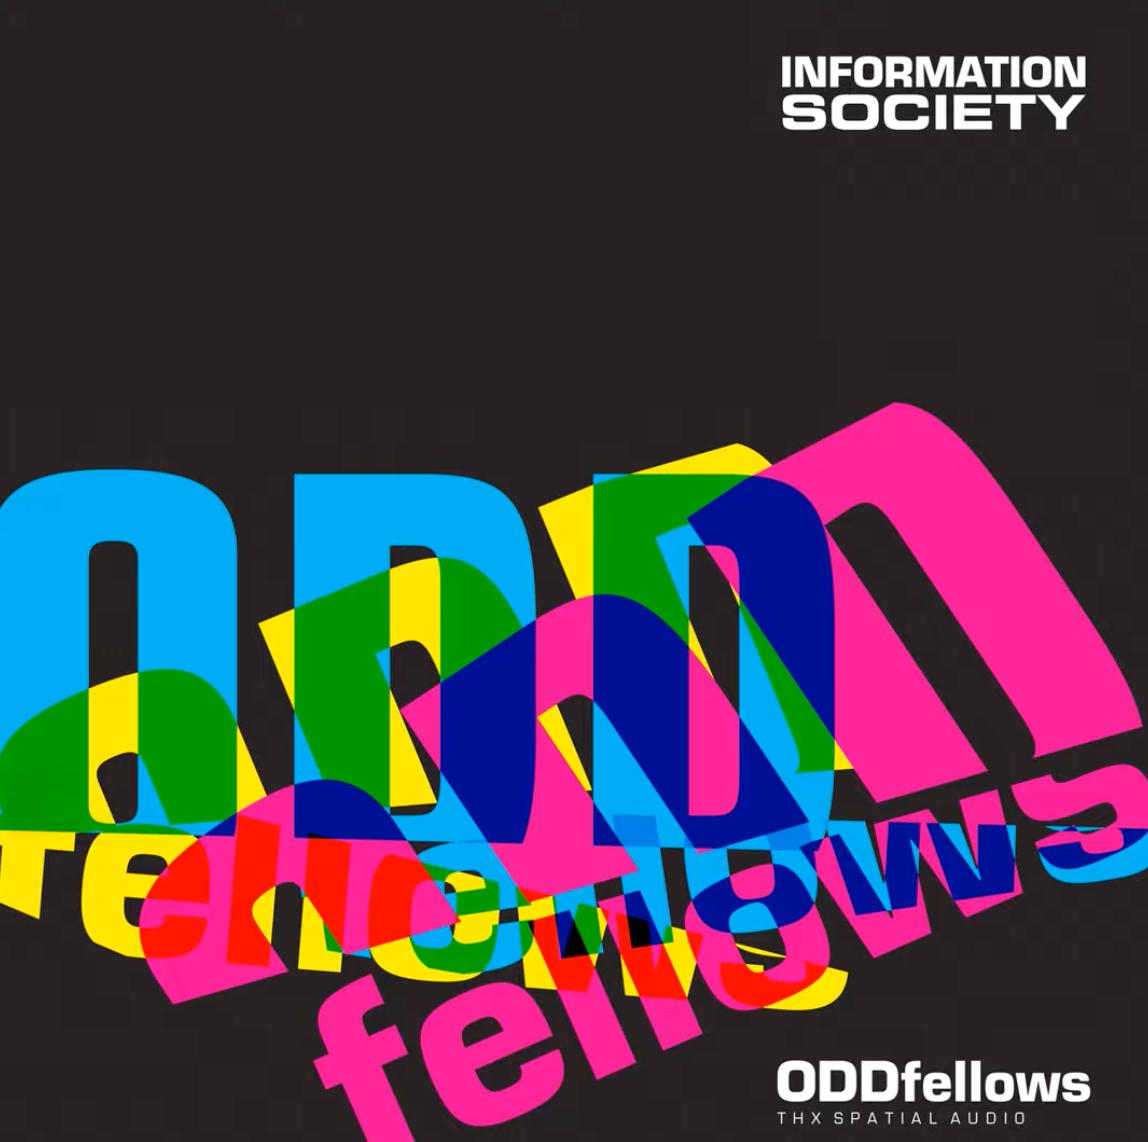 Information Society Oddfellows